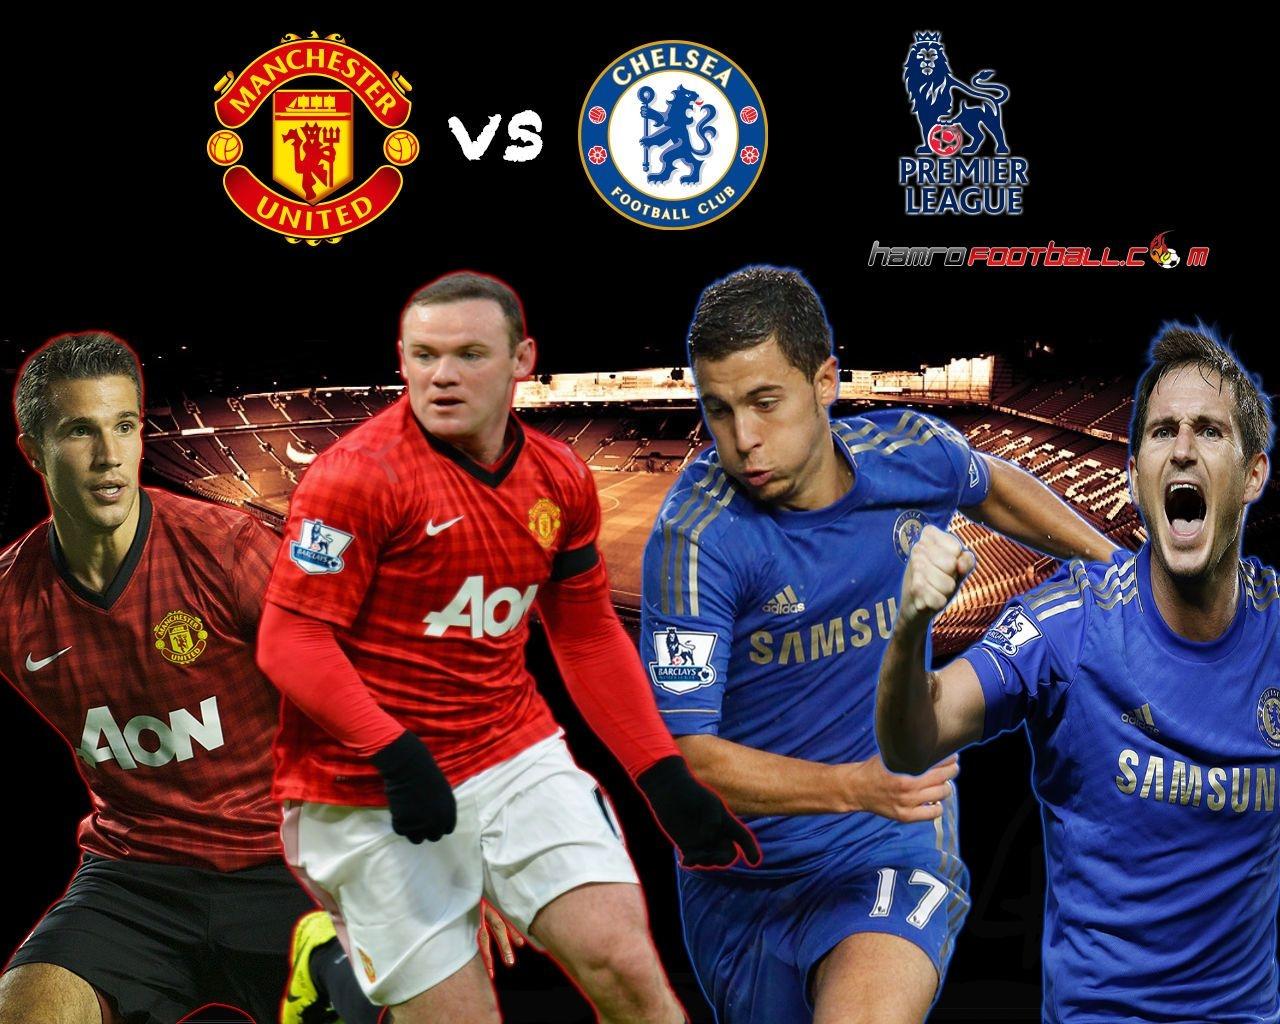 Best Of Chelsea Vs Man Utd Wallpaper Great Foofball Club 1280x1024